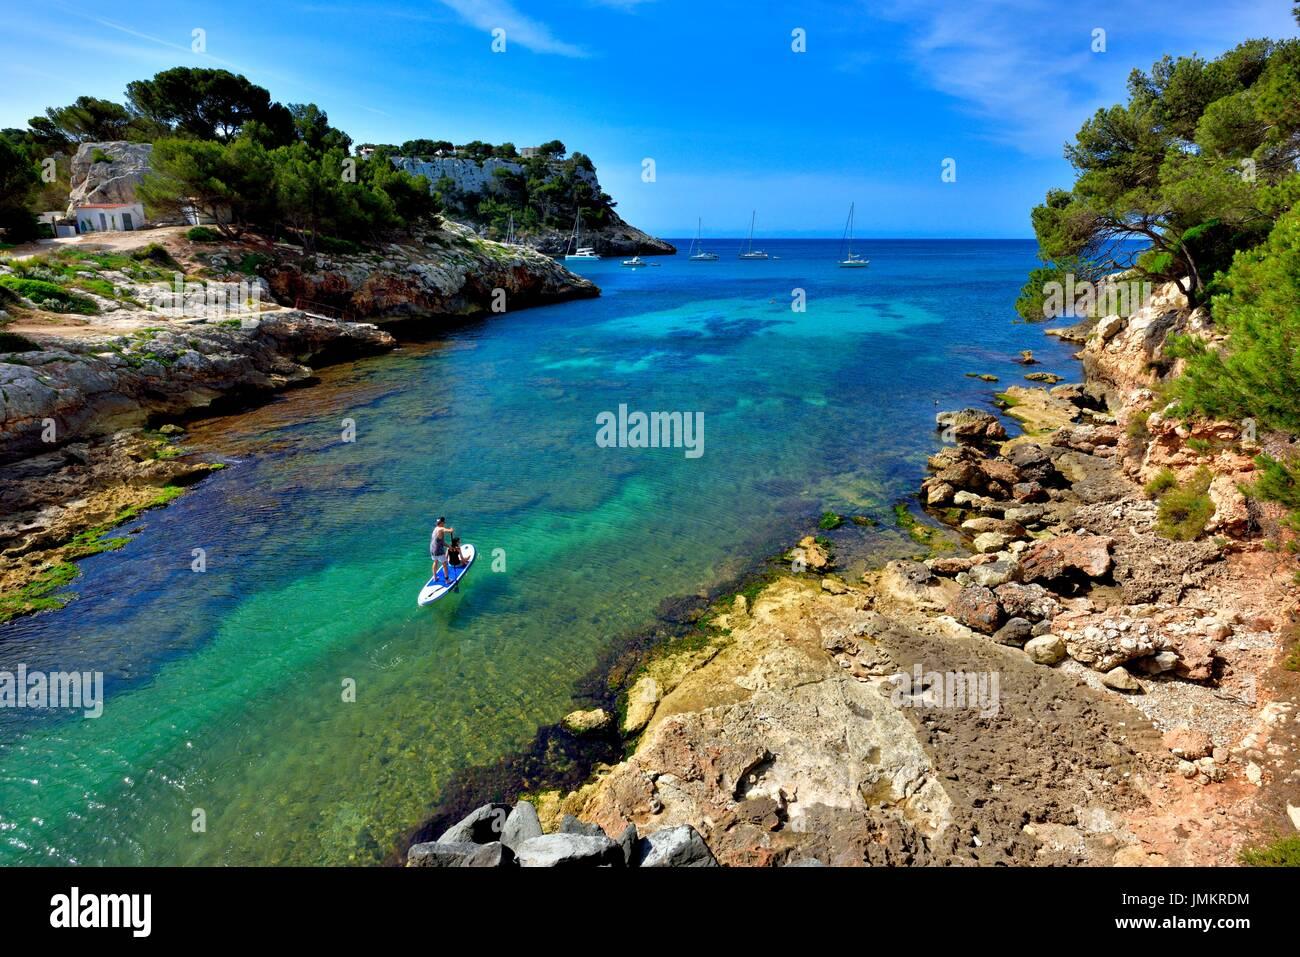 Young couple paddle boarding Cala Galdana Menorca Minorca - Stock Image